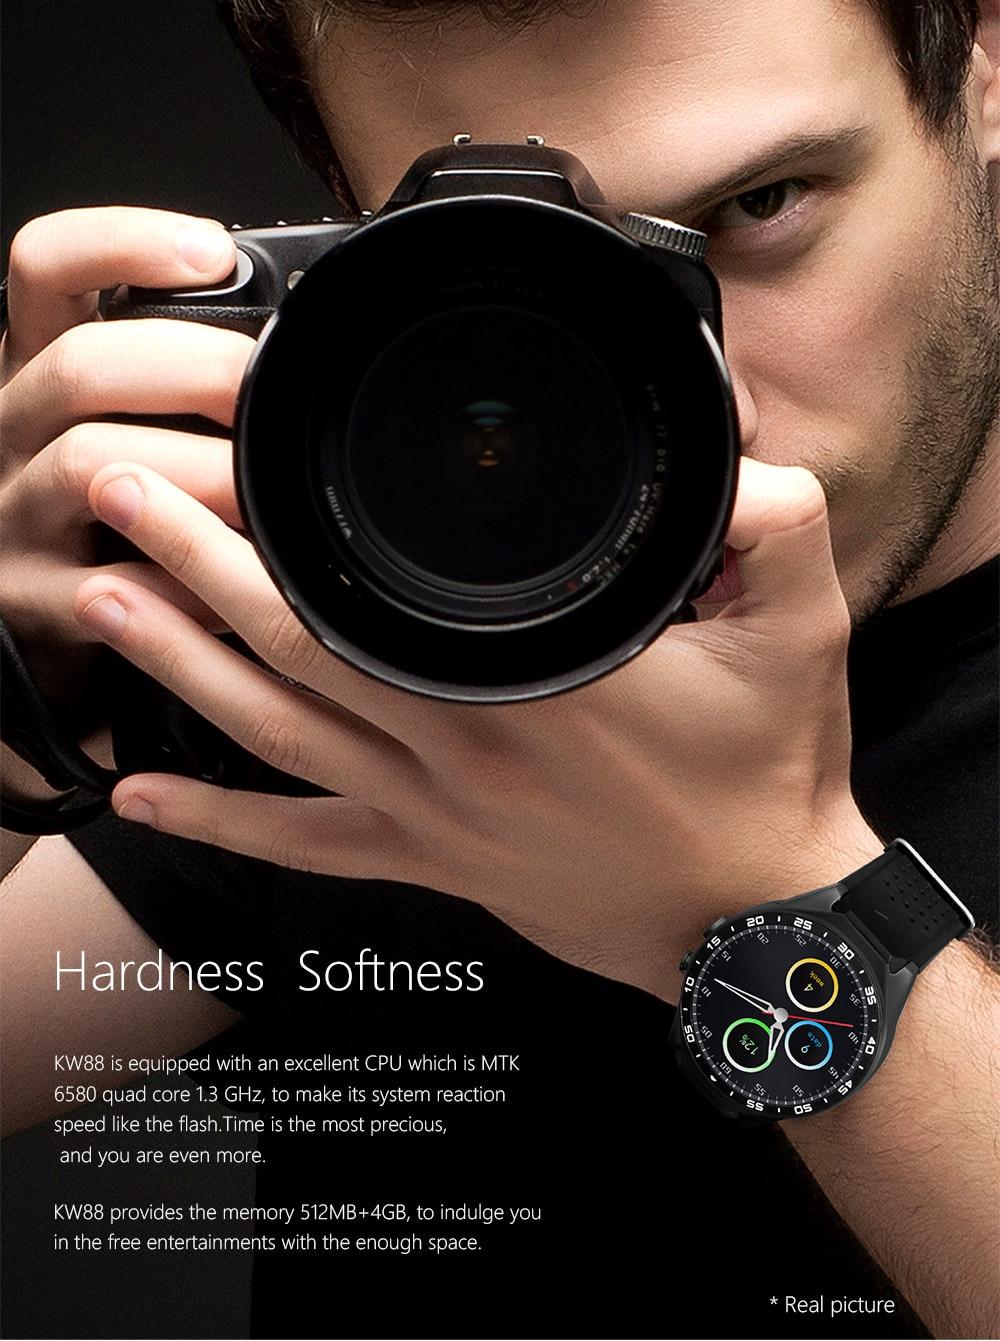 Kaimorui KW88 Smart Watch Android/ IOS Kaimorui KW88 Smart Watch Android/ IOS HTB1A6lJSFXXXXbOXFXXq6xXFXXXO